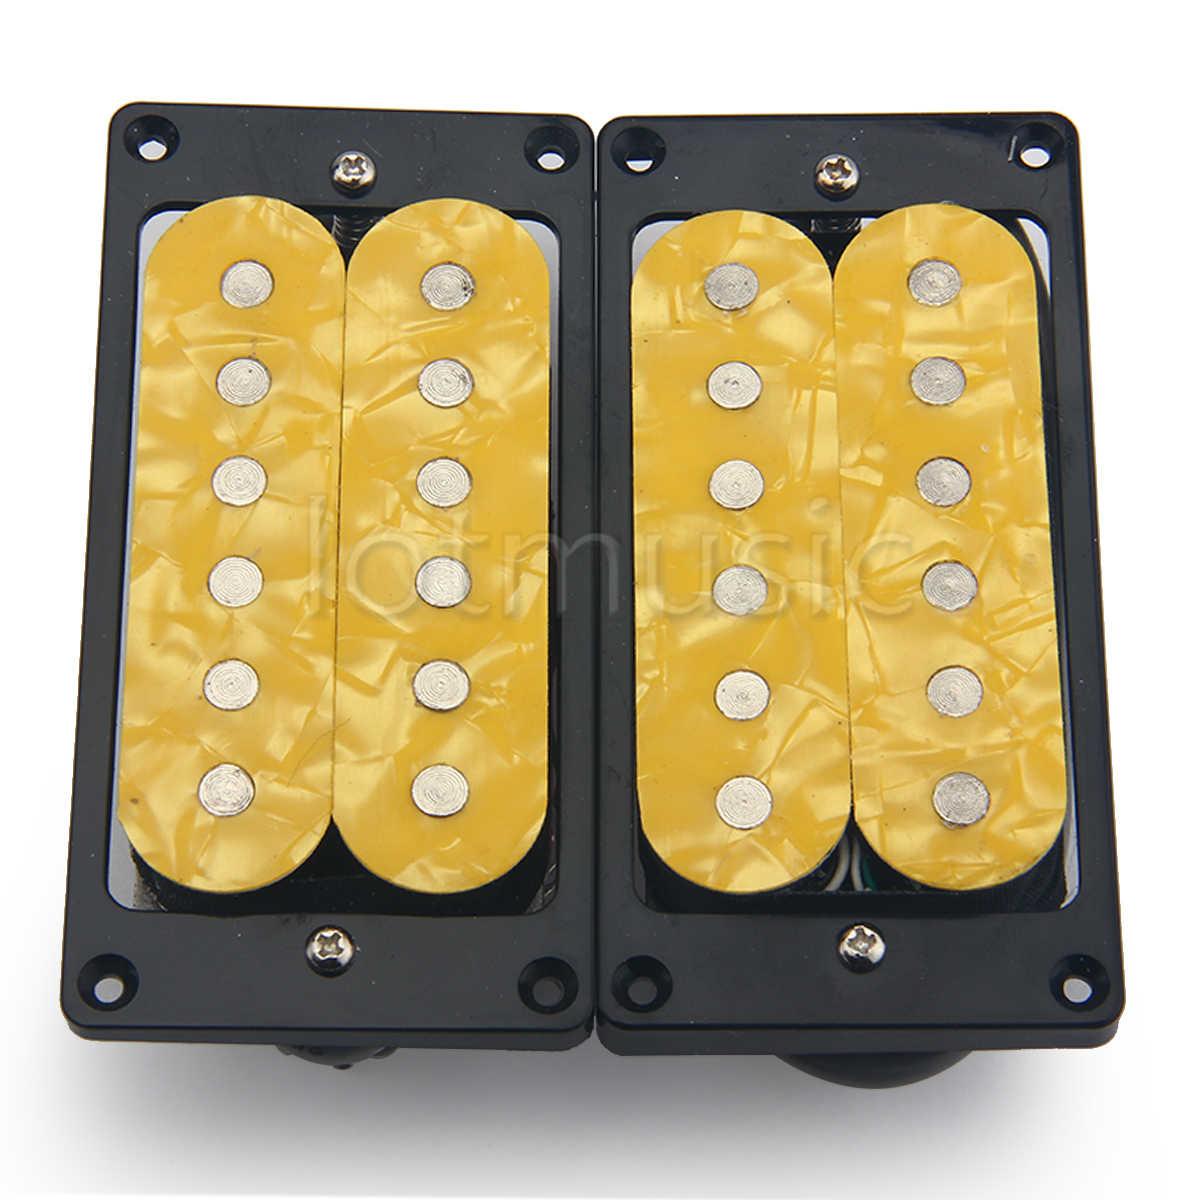 Doppelspule Humbucker Pickup Neck /& Bridge Pickup für E Gitarre